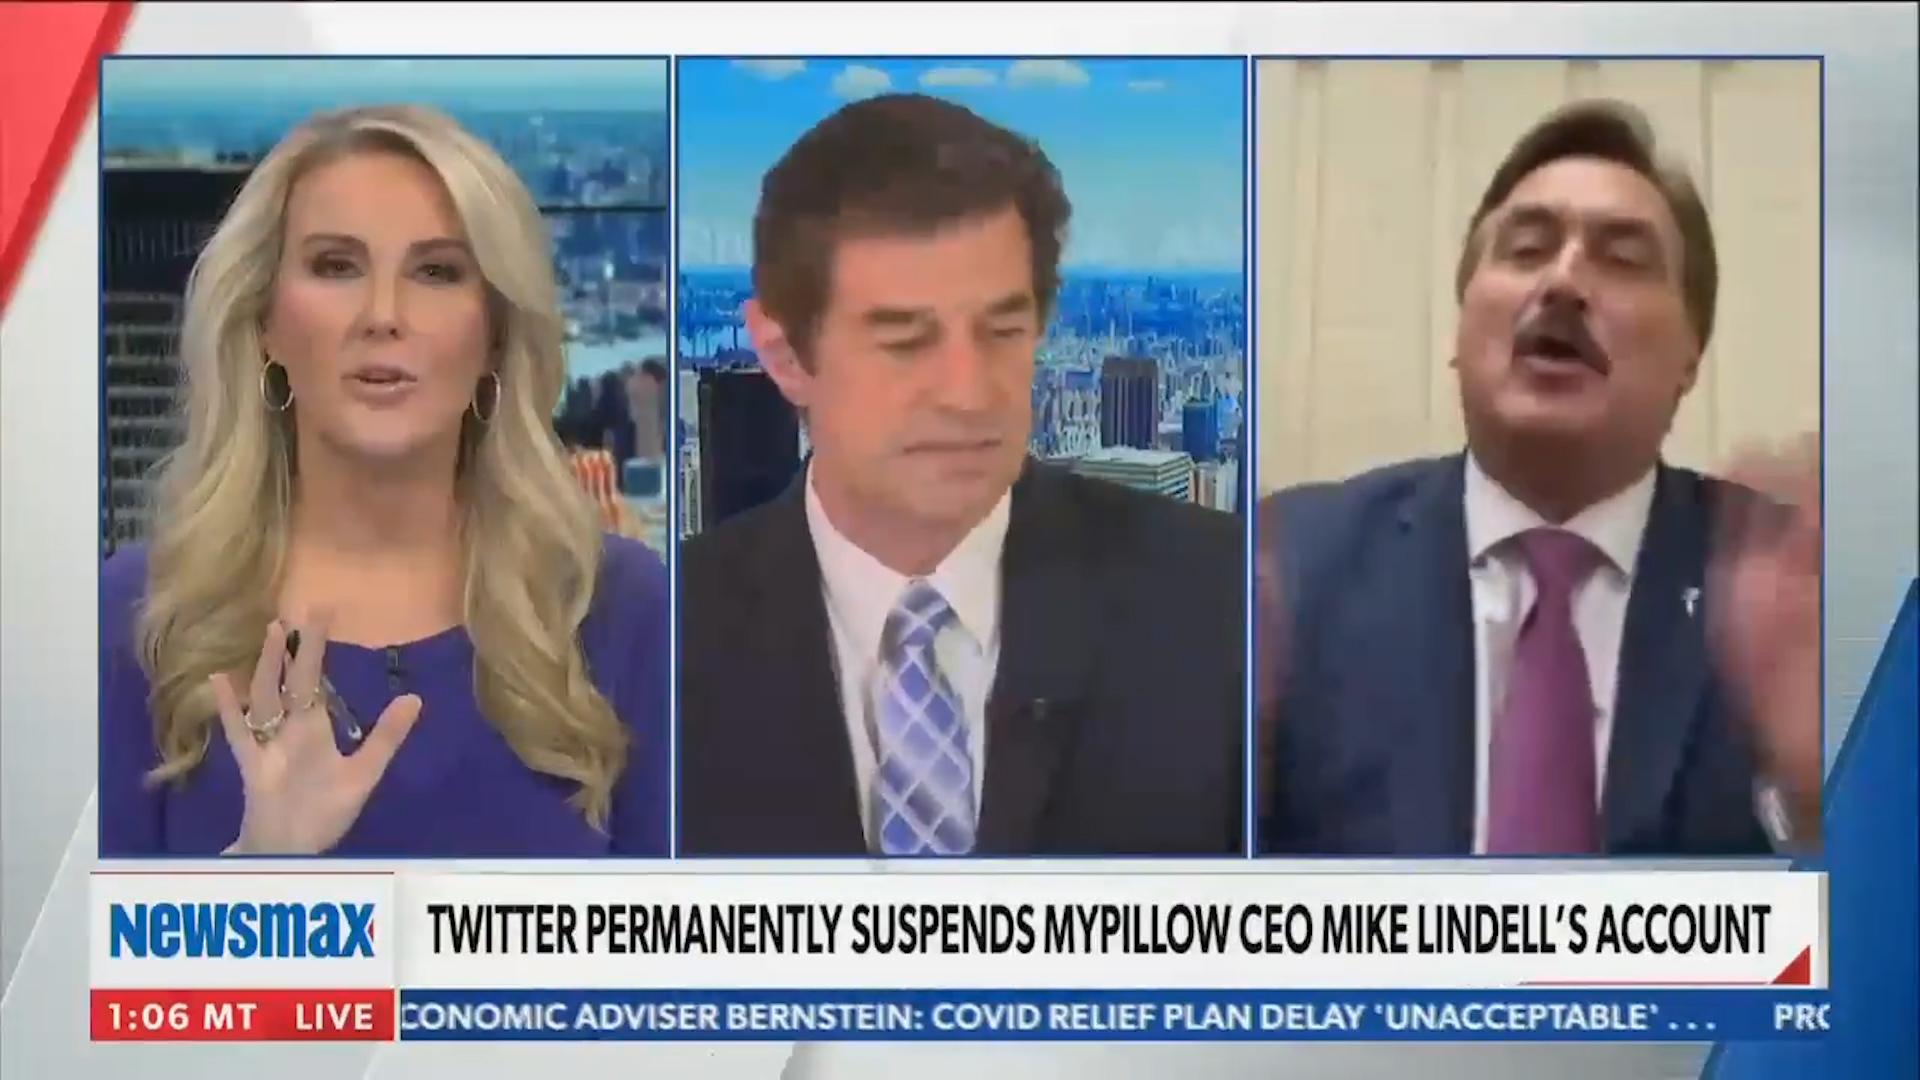 watch newsmax anchor walk off set during mypillow ceo interview